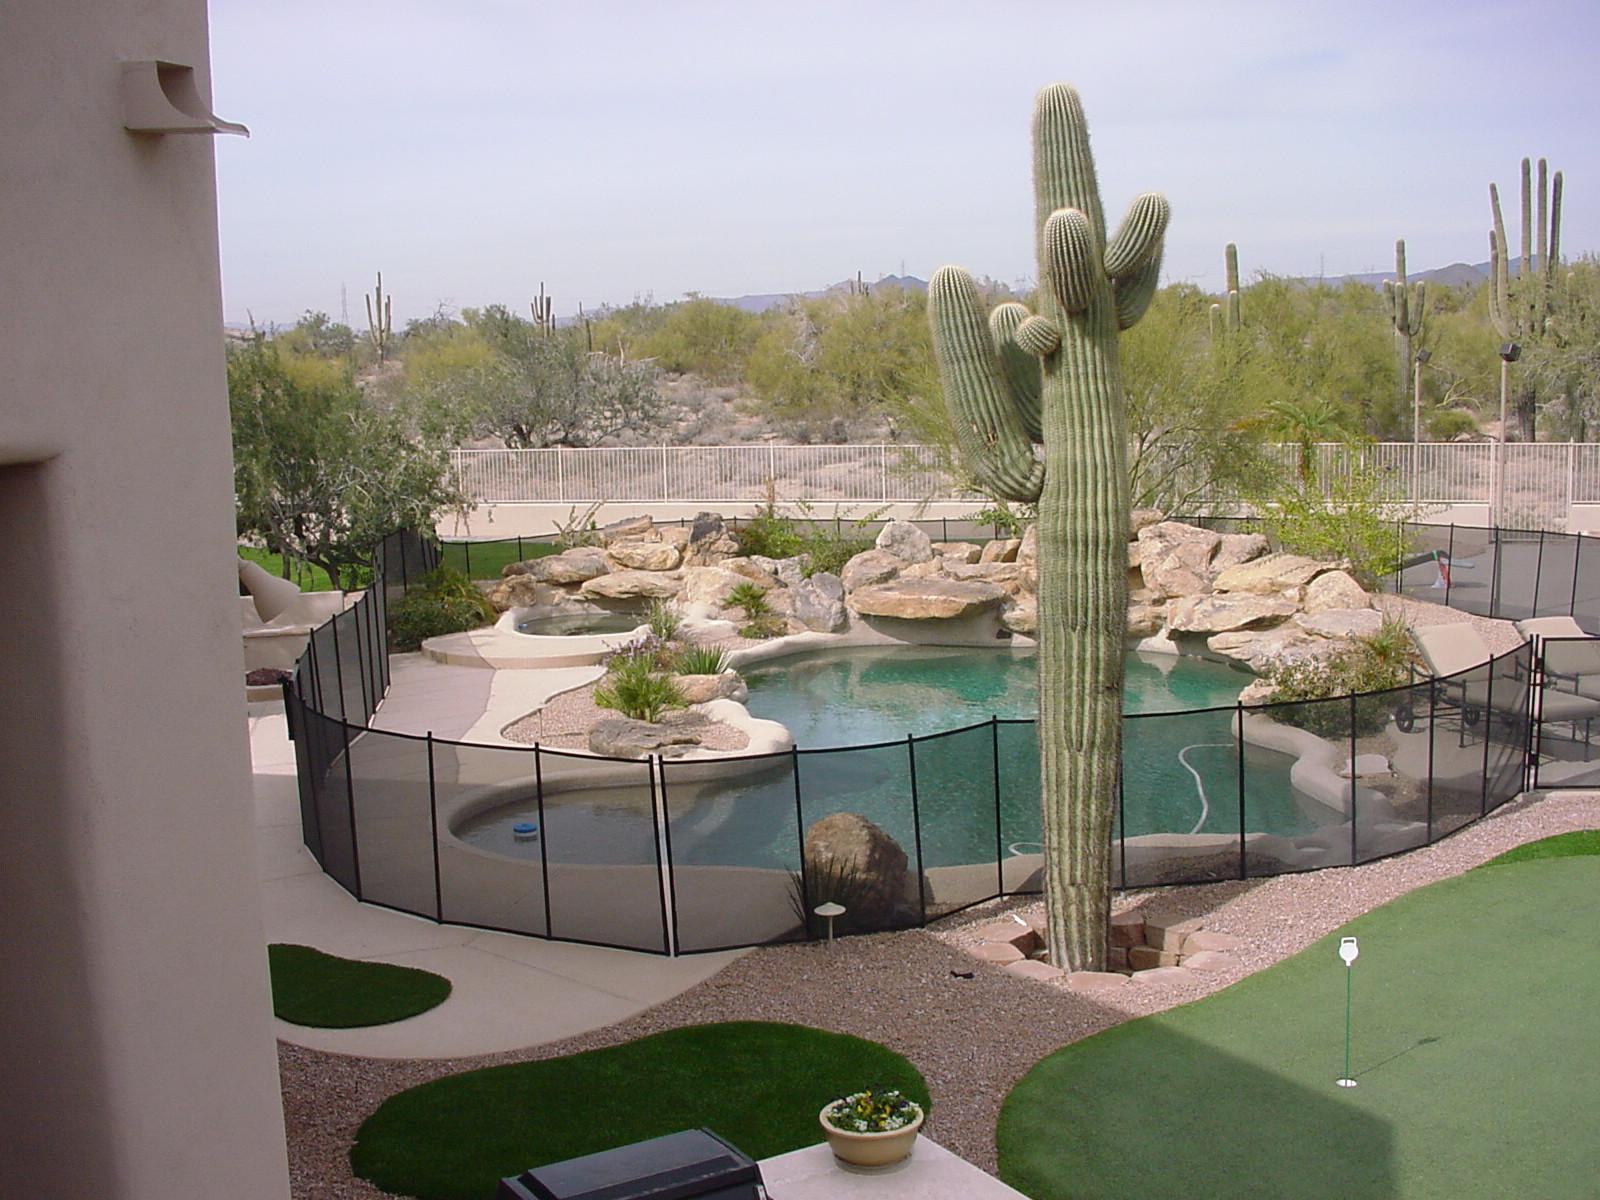 Arizona Pool Fence Pool Safety Fences Covers Gates Amp More